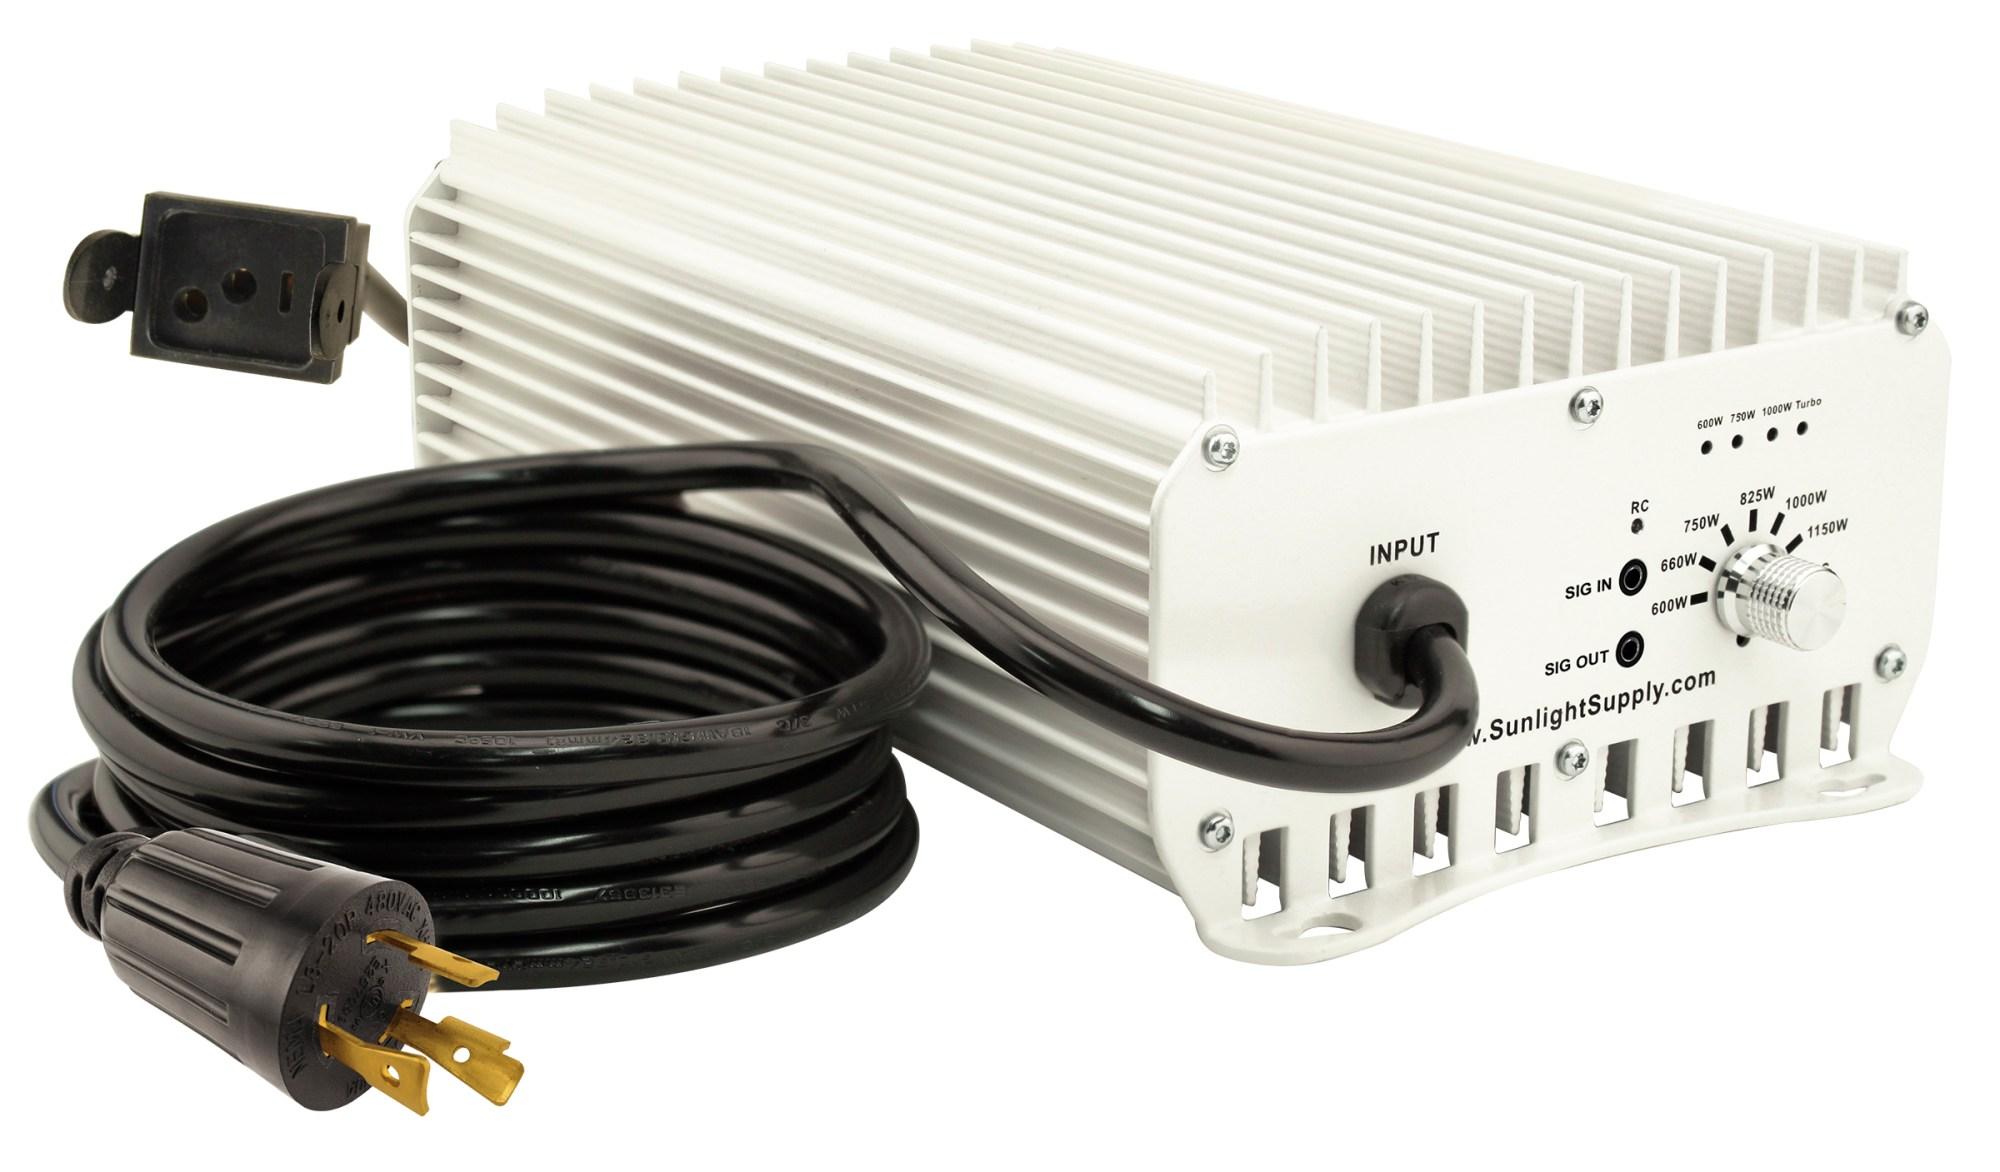 hight resolution of home lighting sun system 1 de etelligent compatible 1000 watt electronic ballast 480 volt